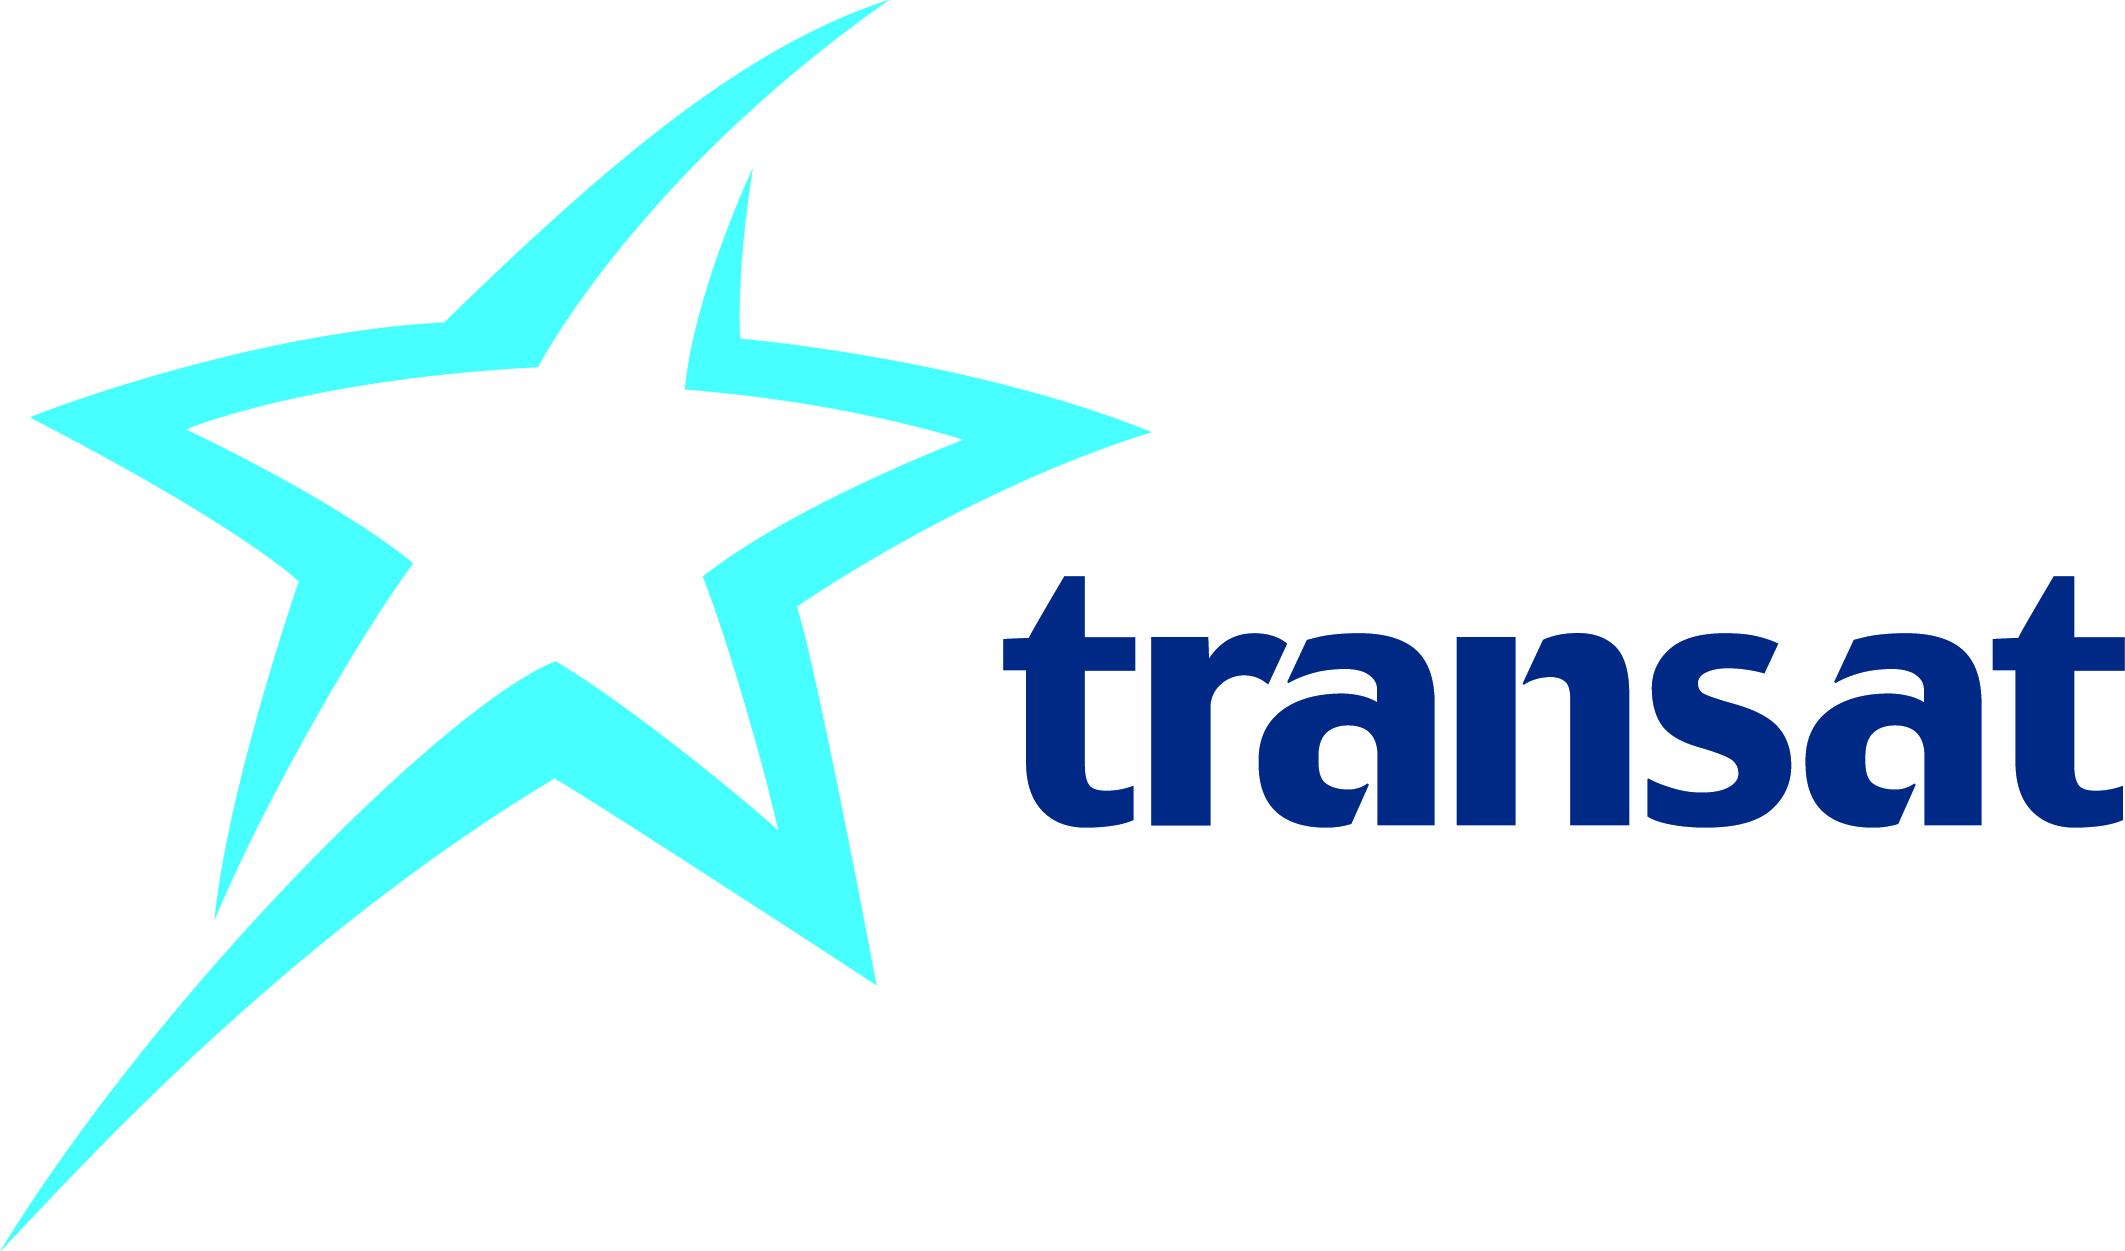 Transat Tours Canada